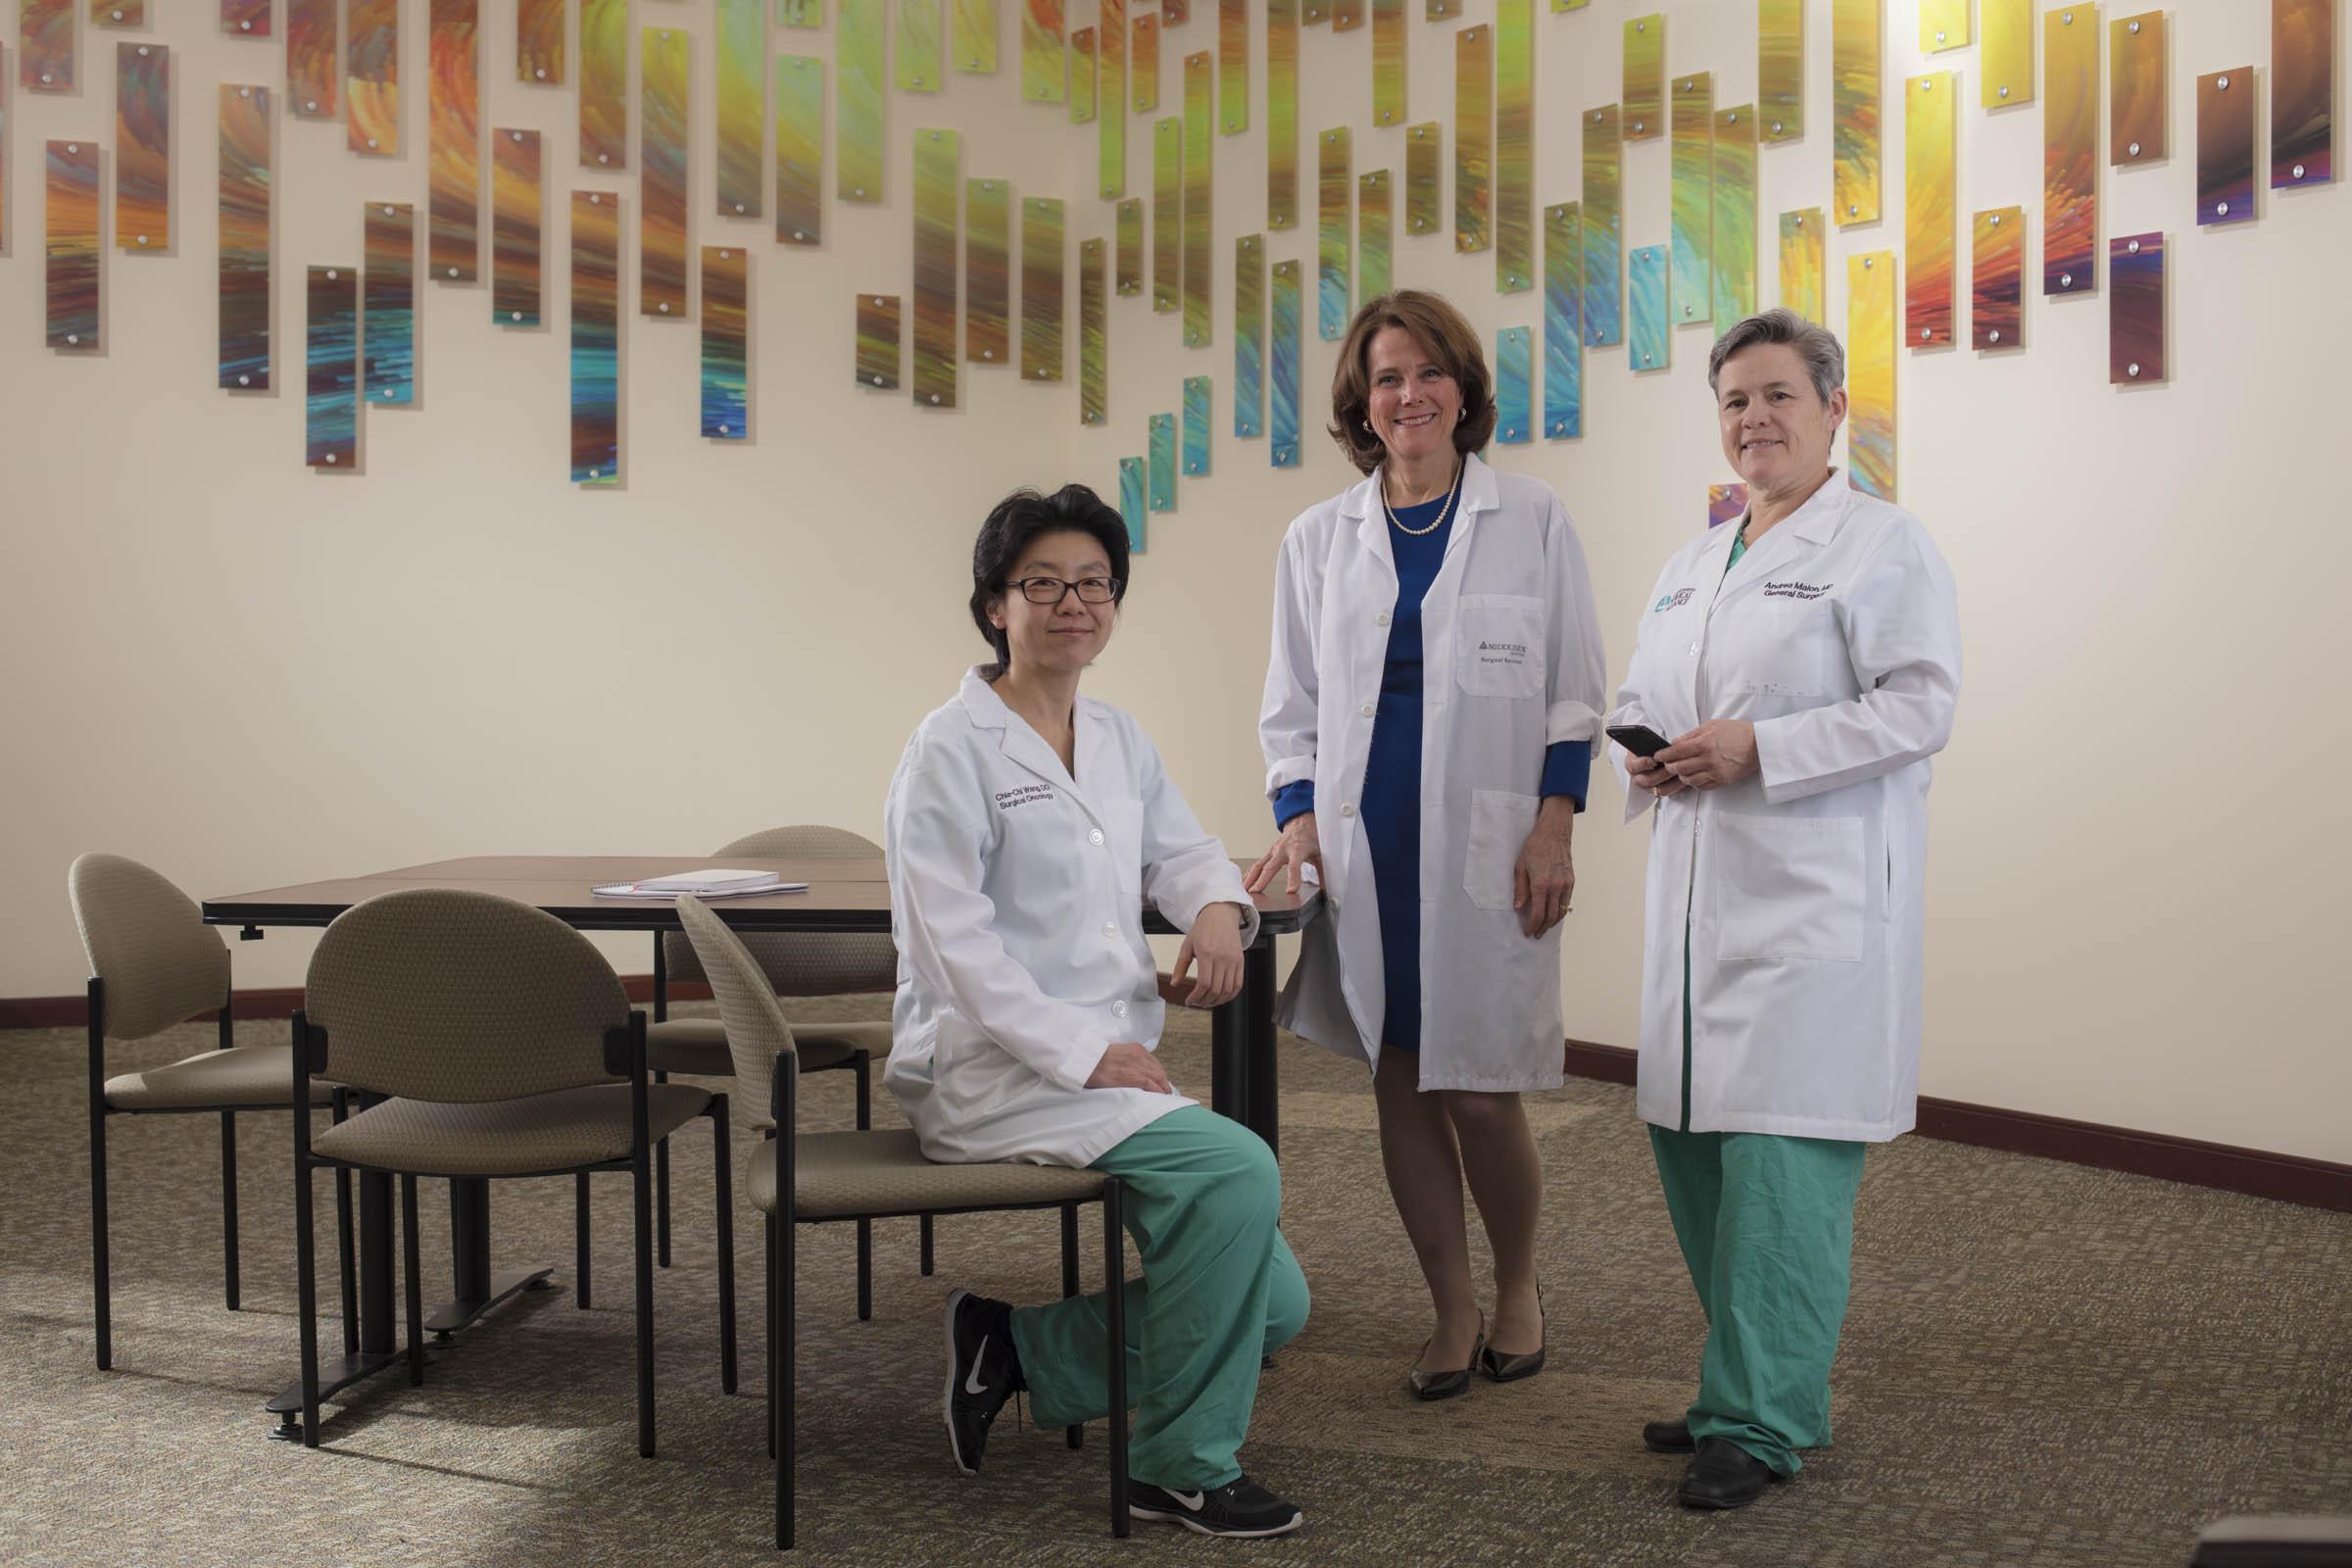 MDSX CCTR Surgeons -1104.jpg